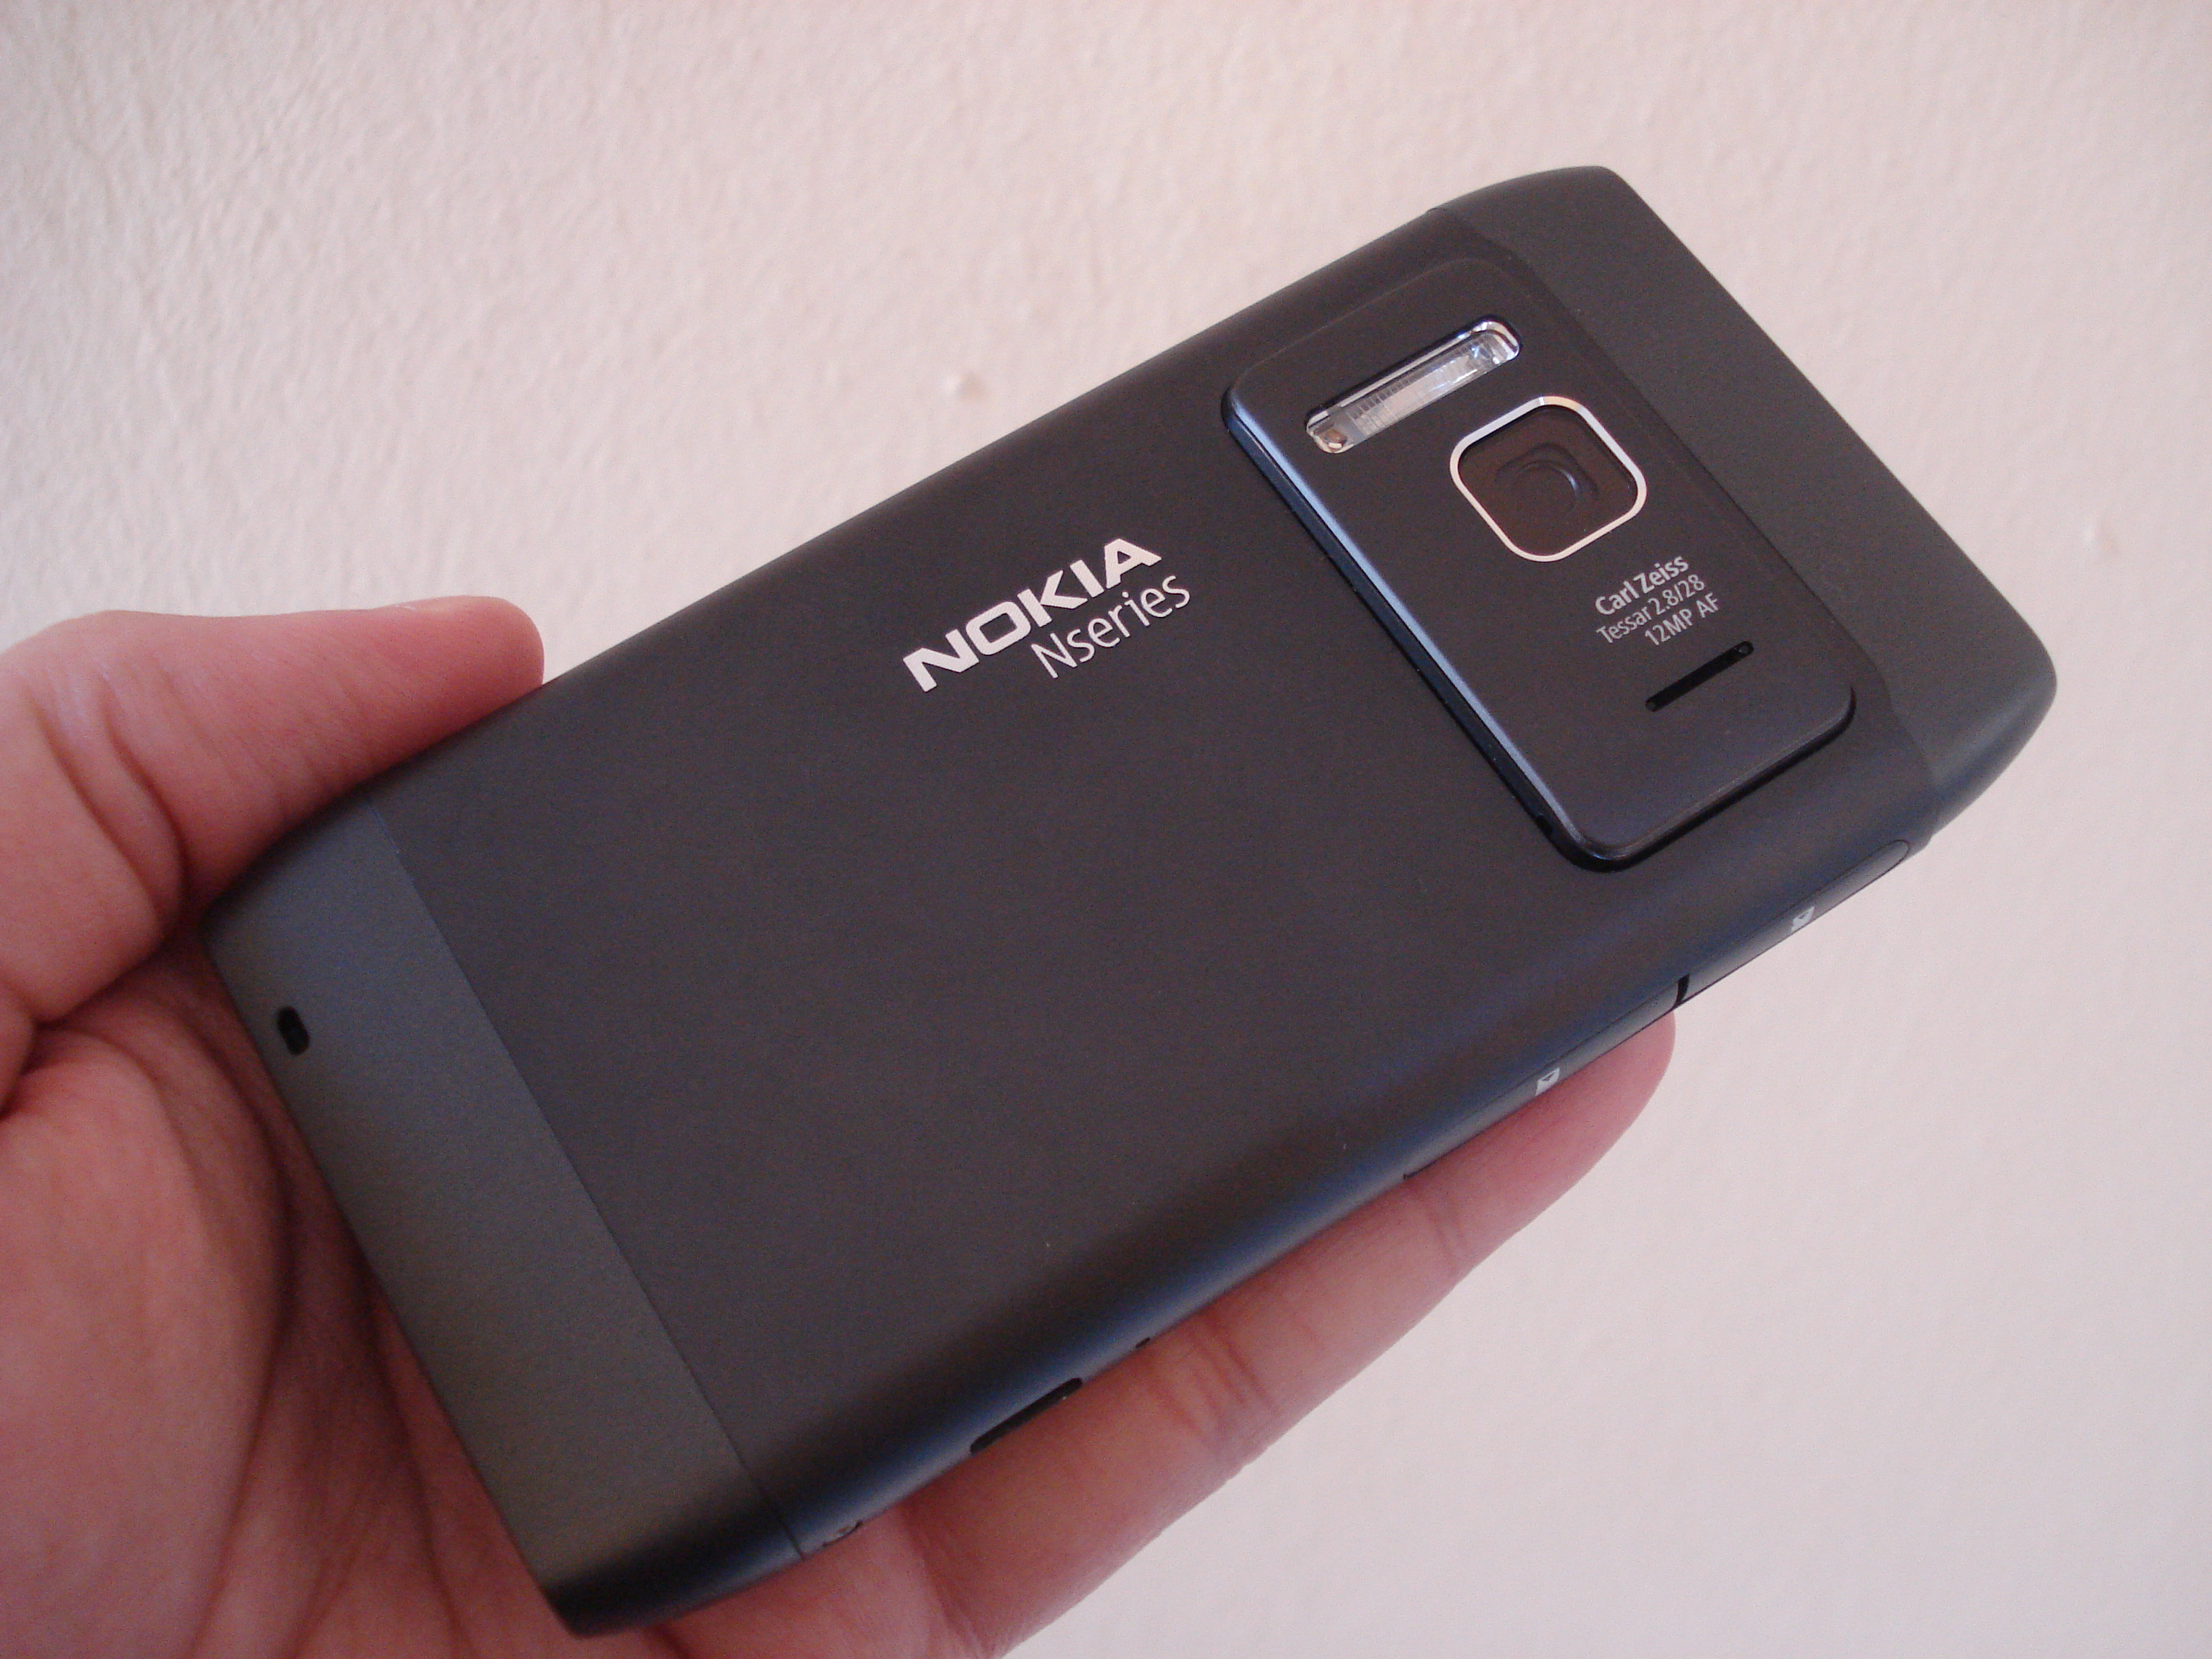 new arrival 001bd 24b34 File:Nokia N8 back.jpg - Wikimedia Commons